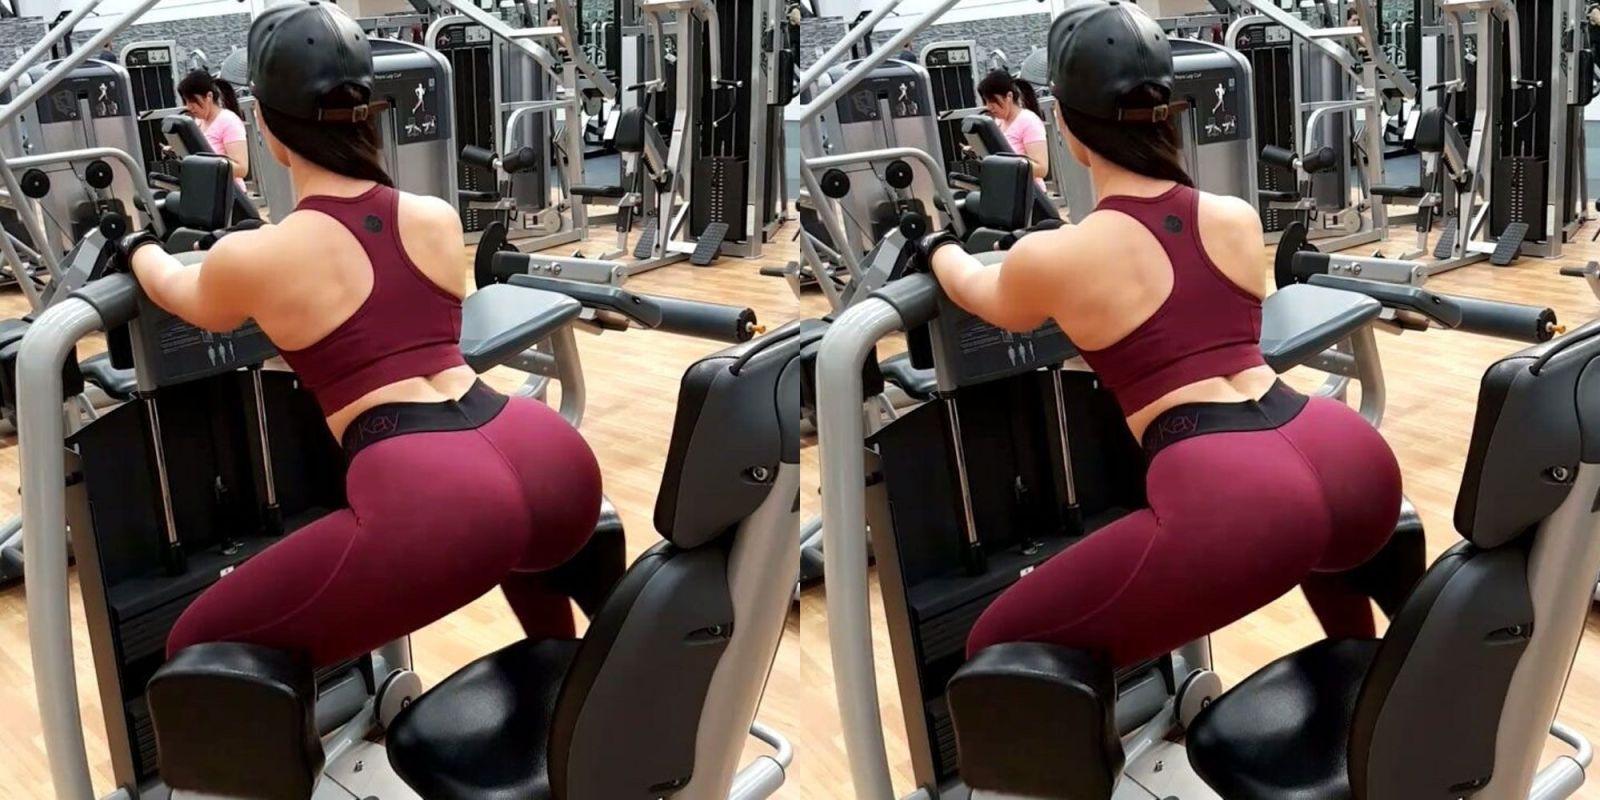 Teen girls that fuck gym eqement